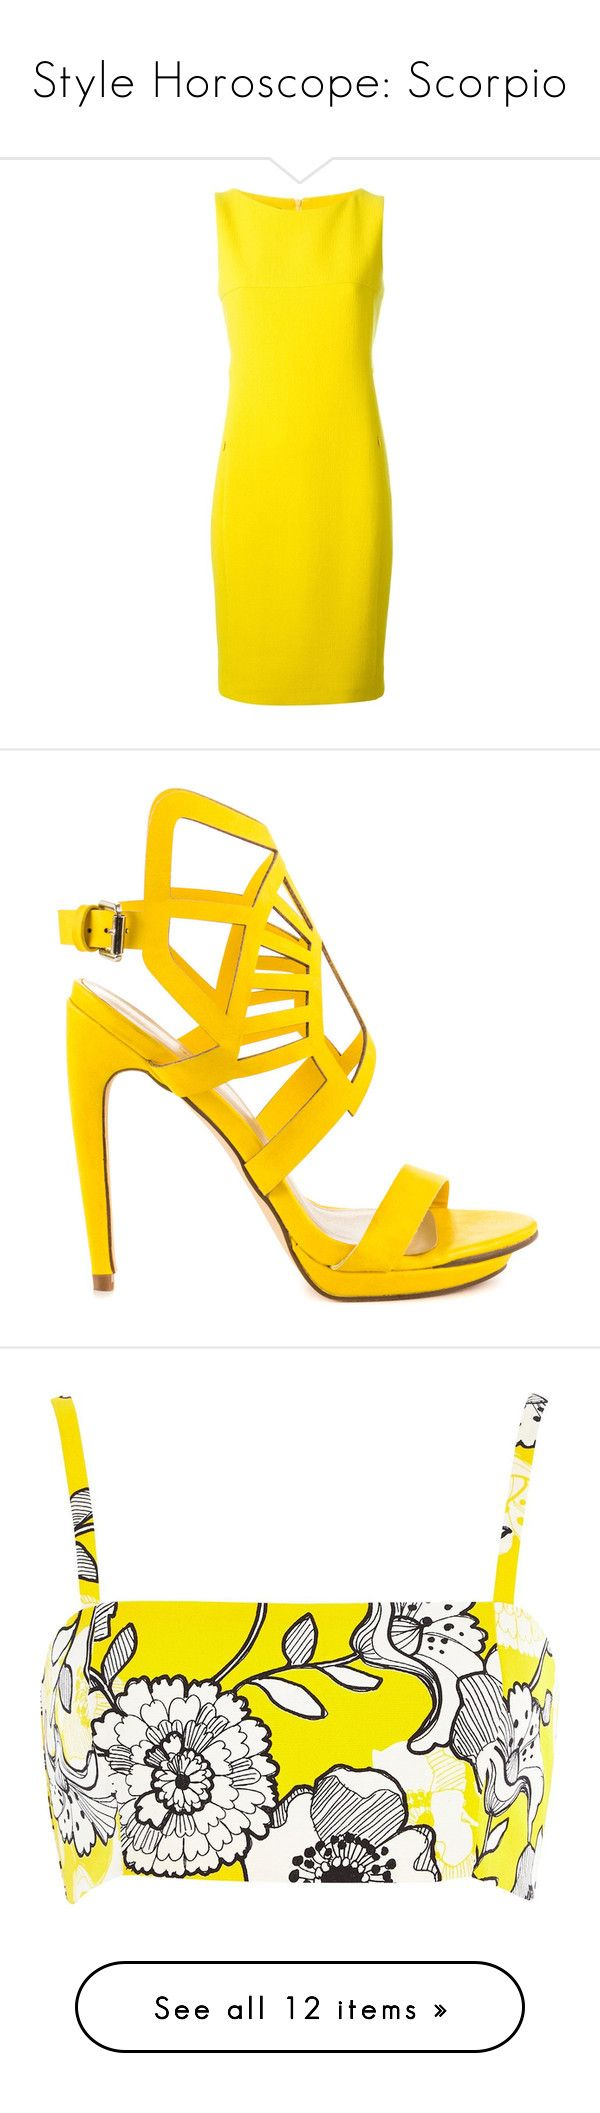 """Style Horoscope: Scorpio"" by polyvore-editorial ❤ liked on Polyvore featuring scorpio, stylehoroscope, dresses, akris dresses, yellow midi dress, akris, wool dress, yellow dress, shoes and heels"